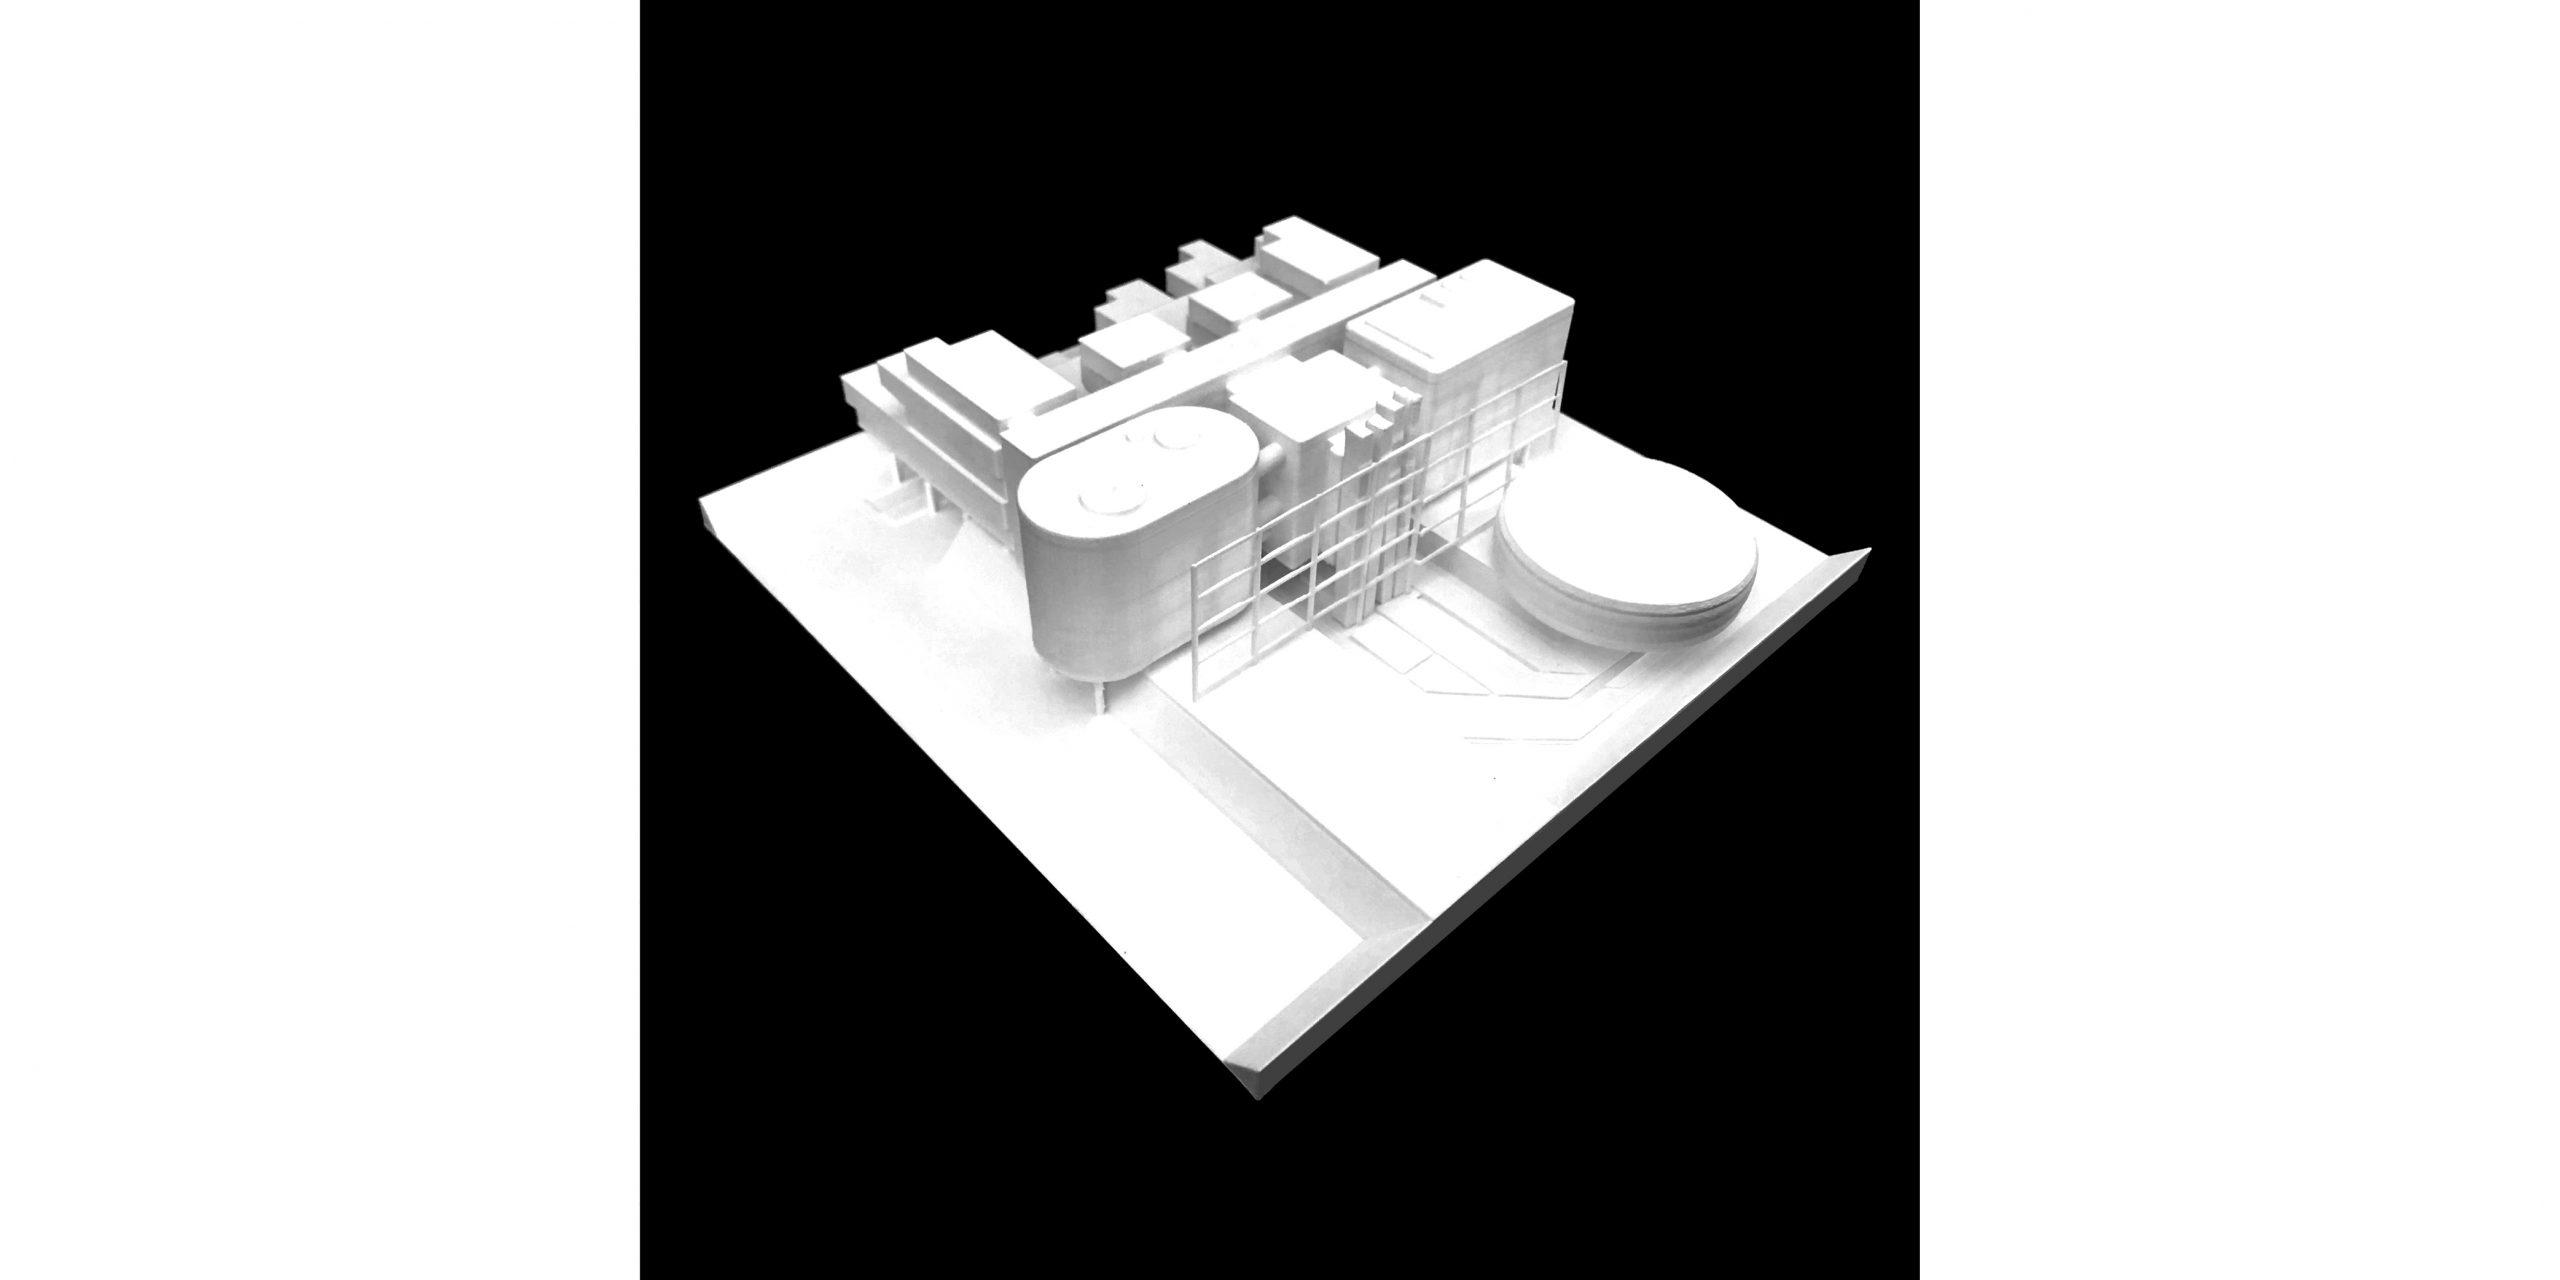 OCA architects Barcelona Prague Brno Black fields NUKIB KIB architecture competition Hernan Lleida Ruiz Bernardo Garcia Morales (10)3